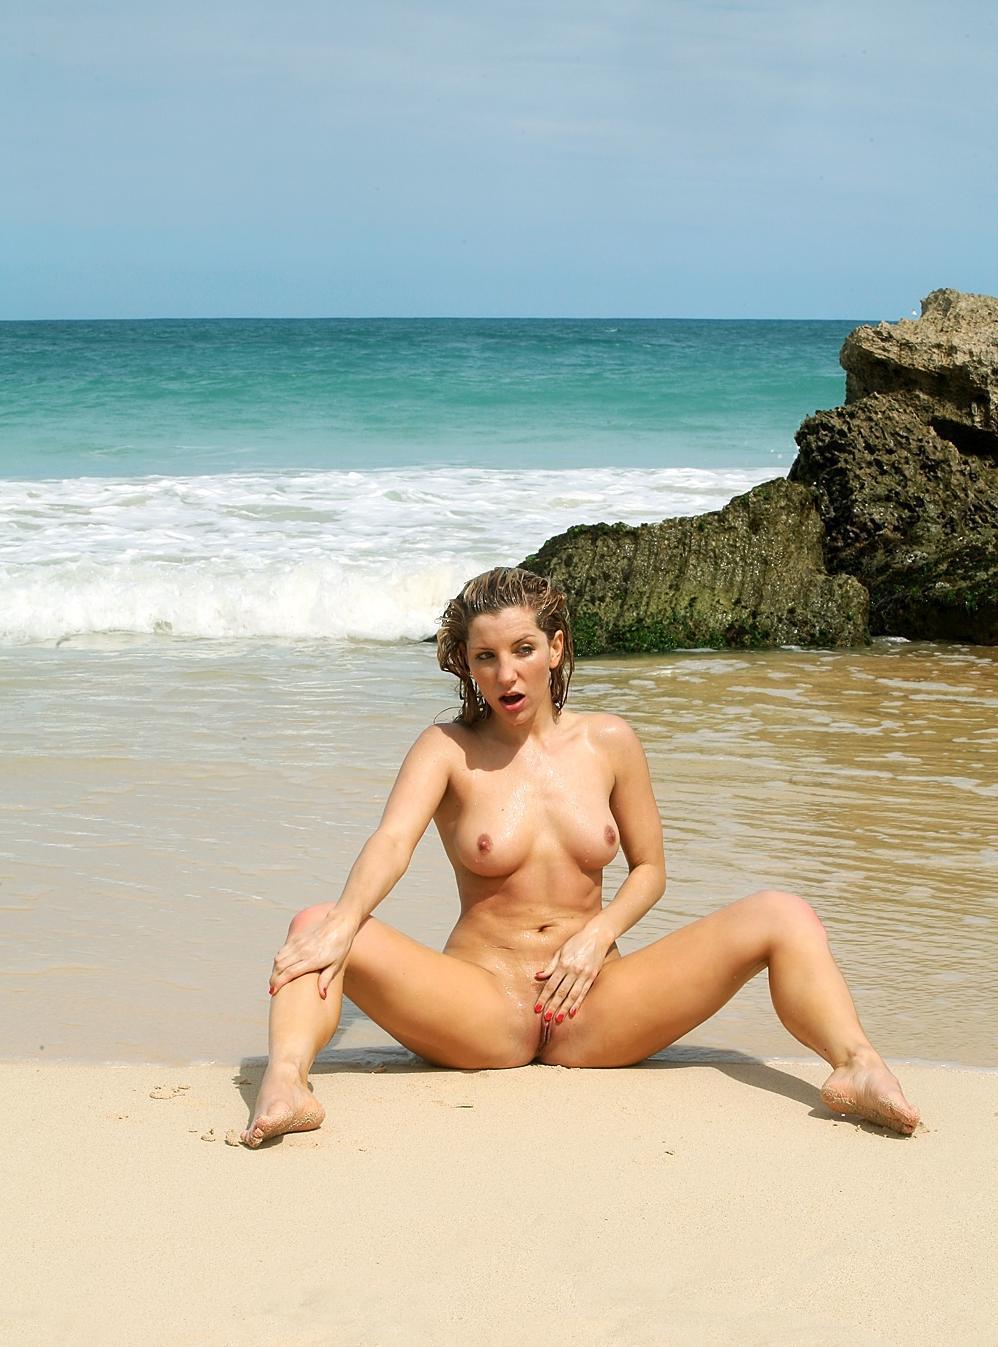 Caught masturbating near the sea